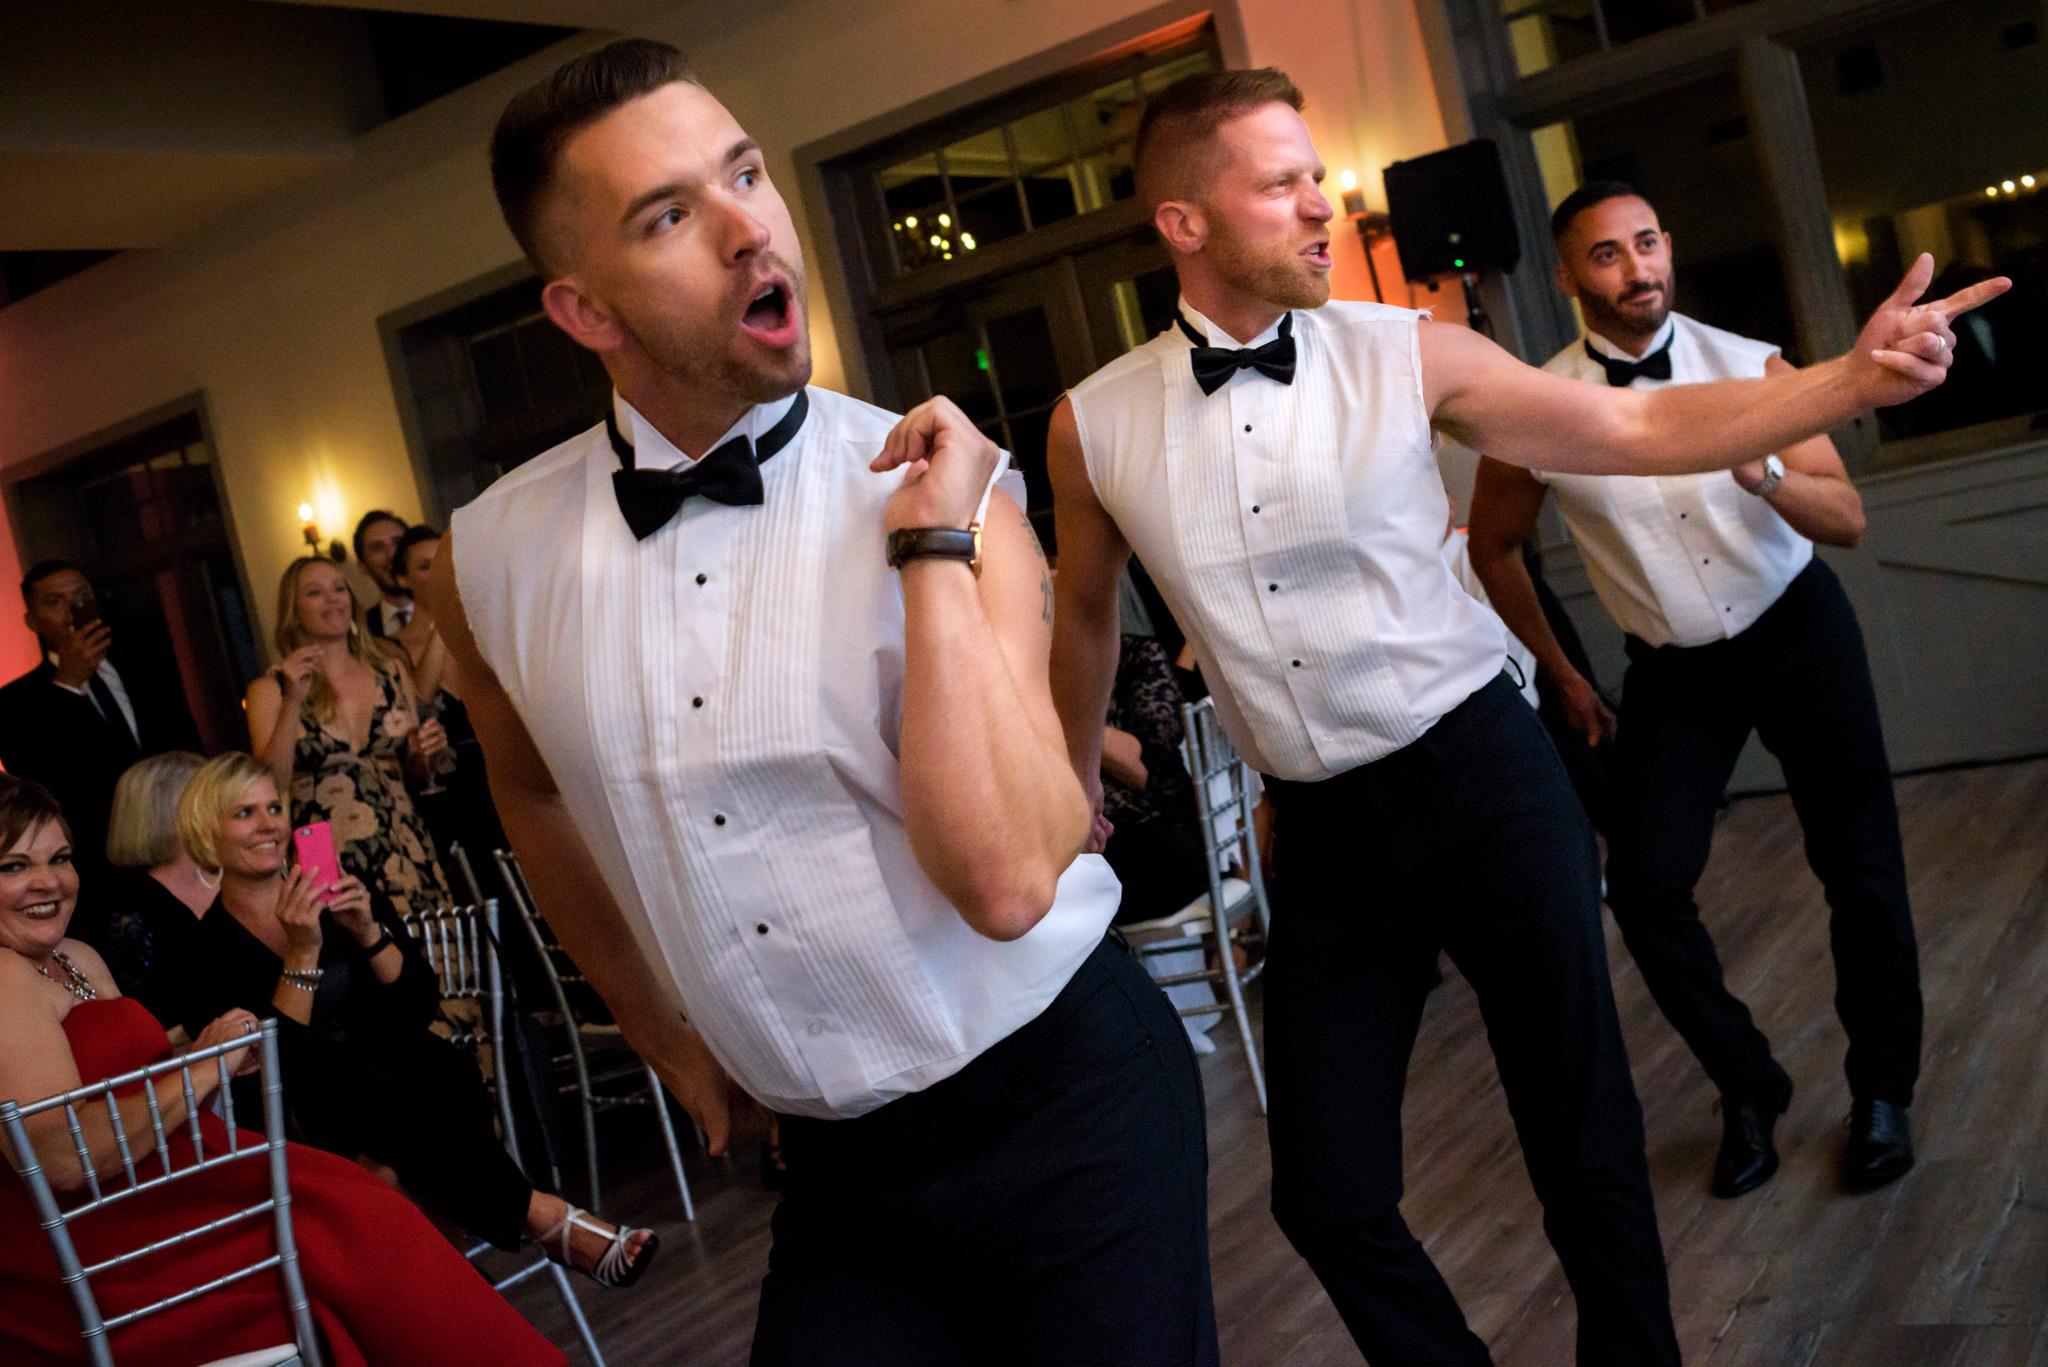 Eric and David's wedding at Oceano Hotel in Half Moon Bay, California.